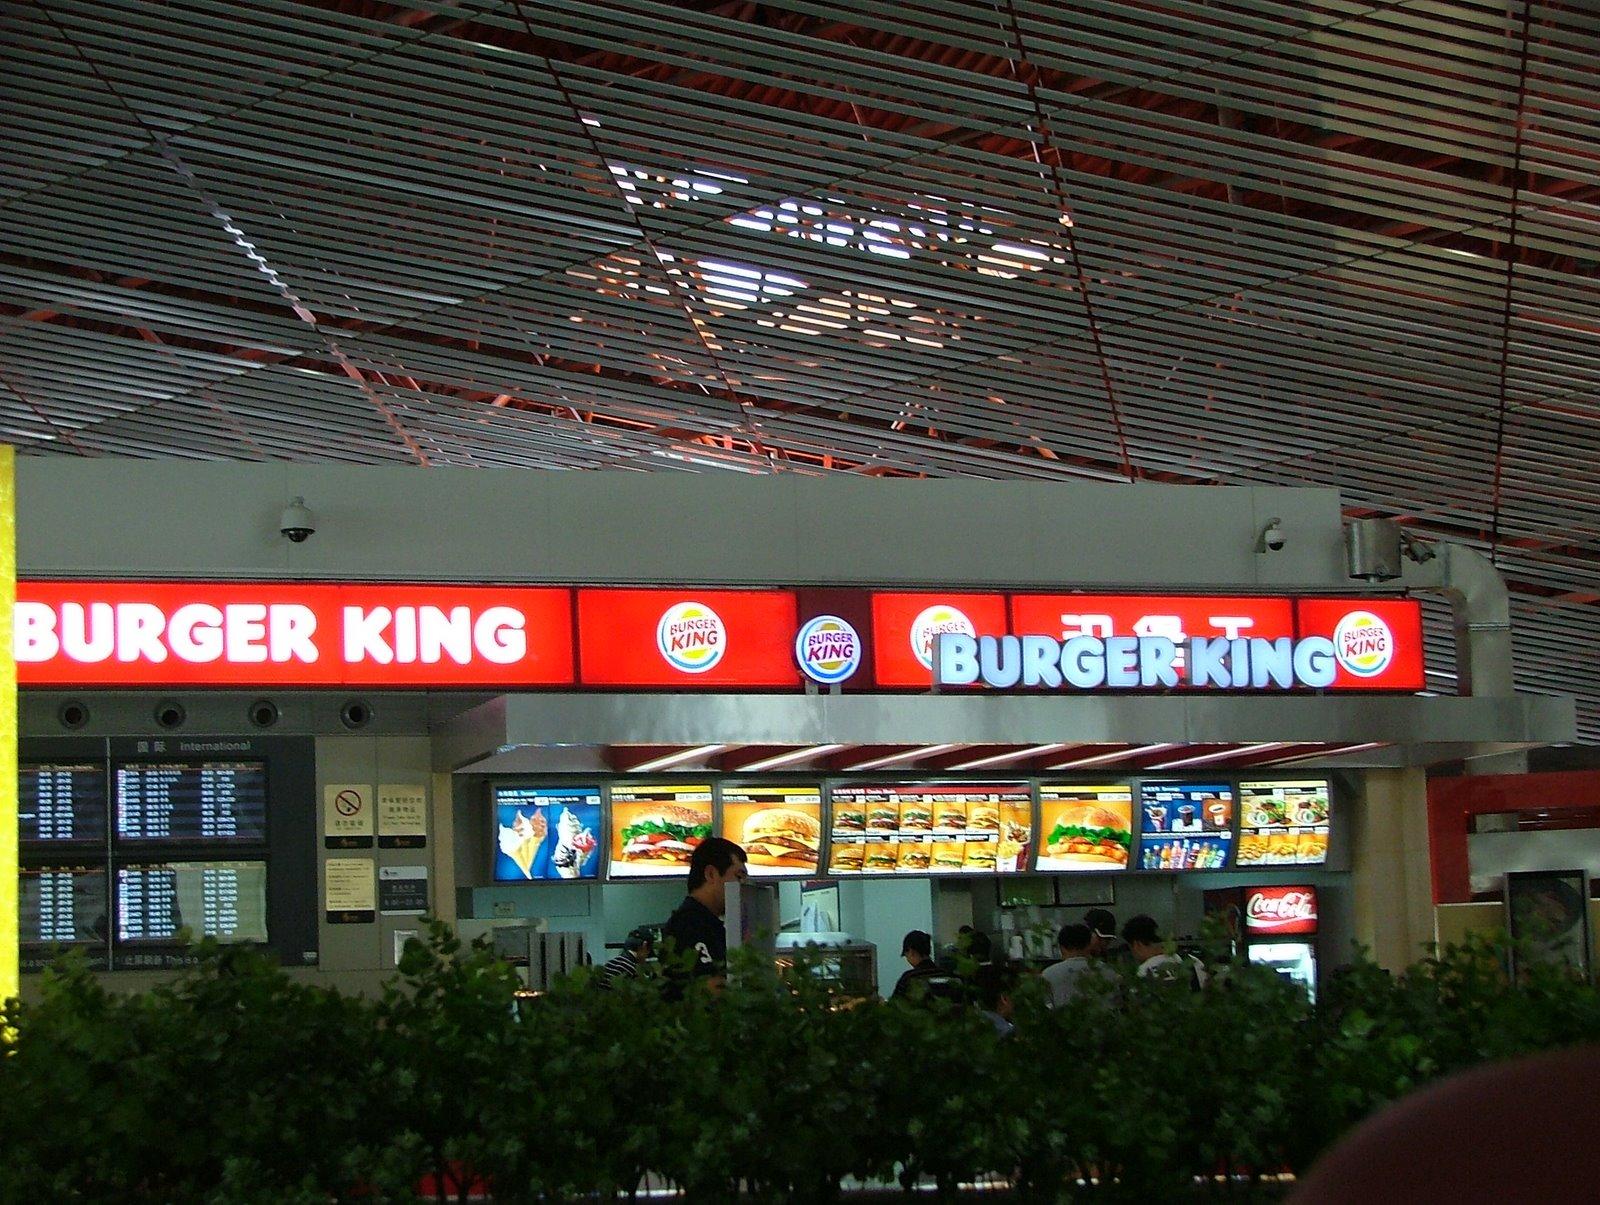 File burger king interior cork ireland 2012 jpg wikimedia commons - A Burger King In Beijing China